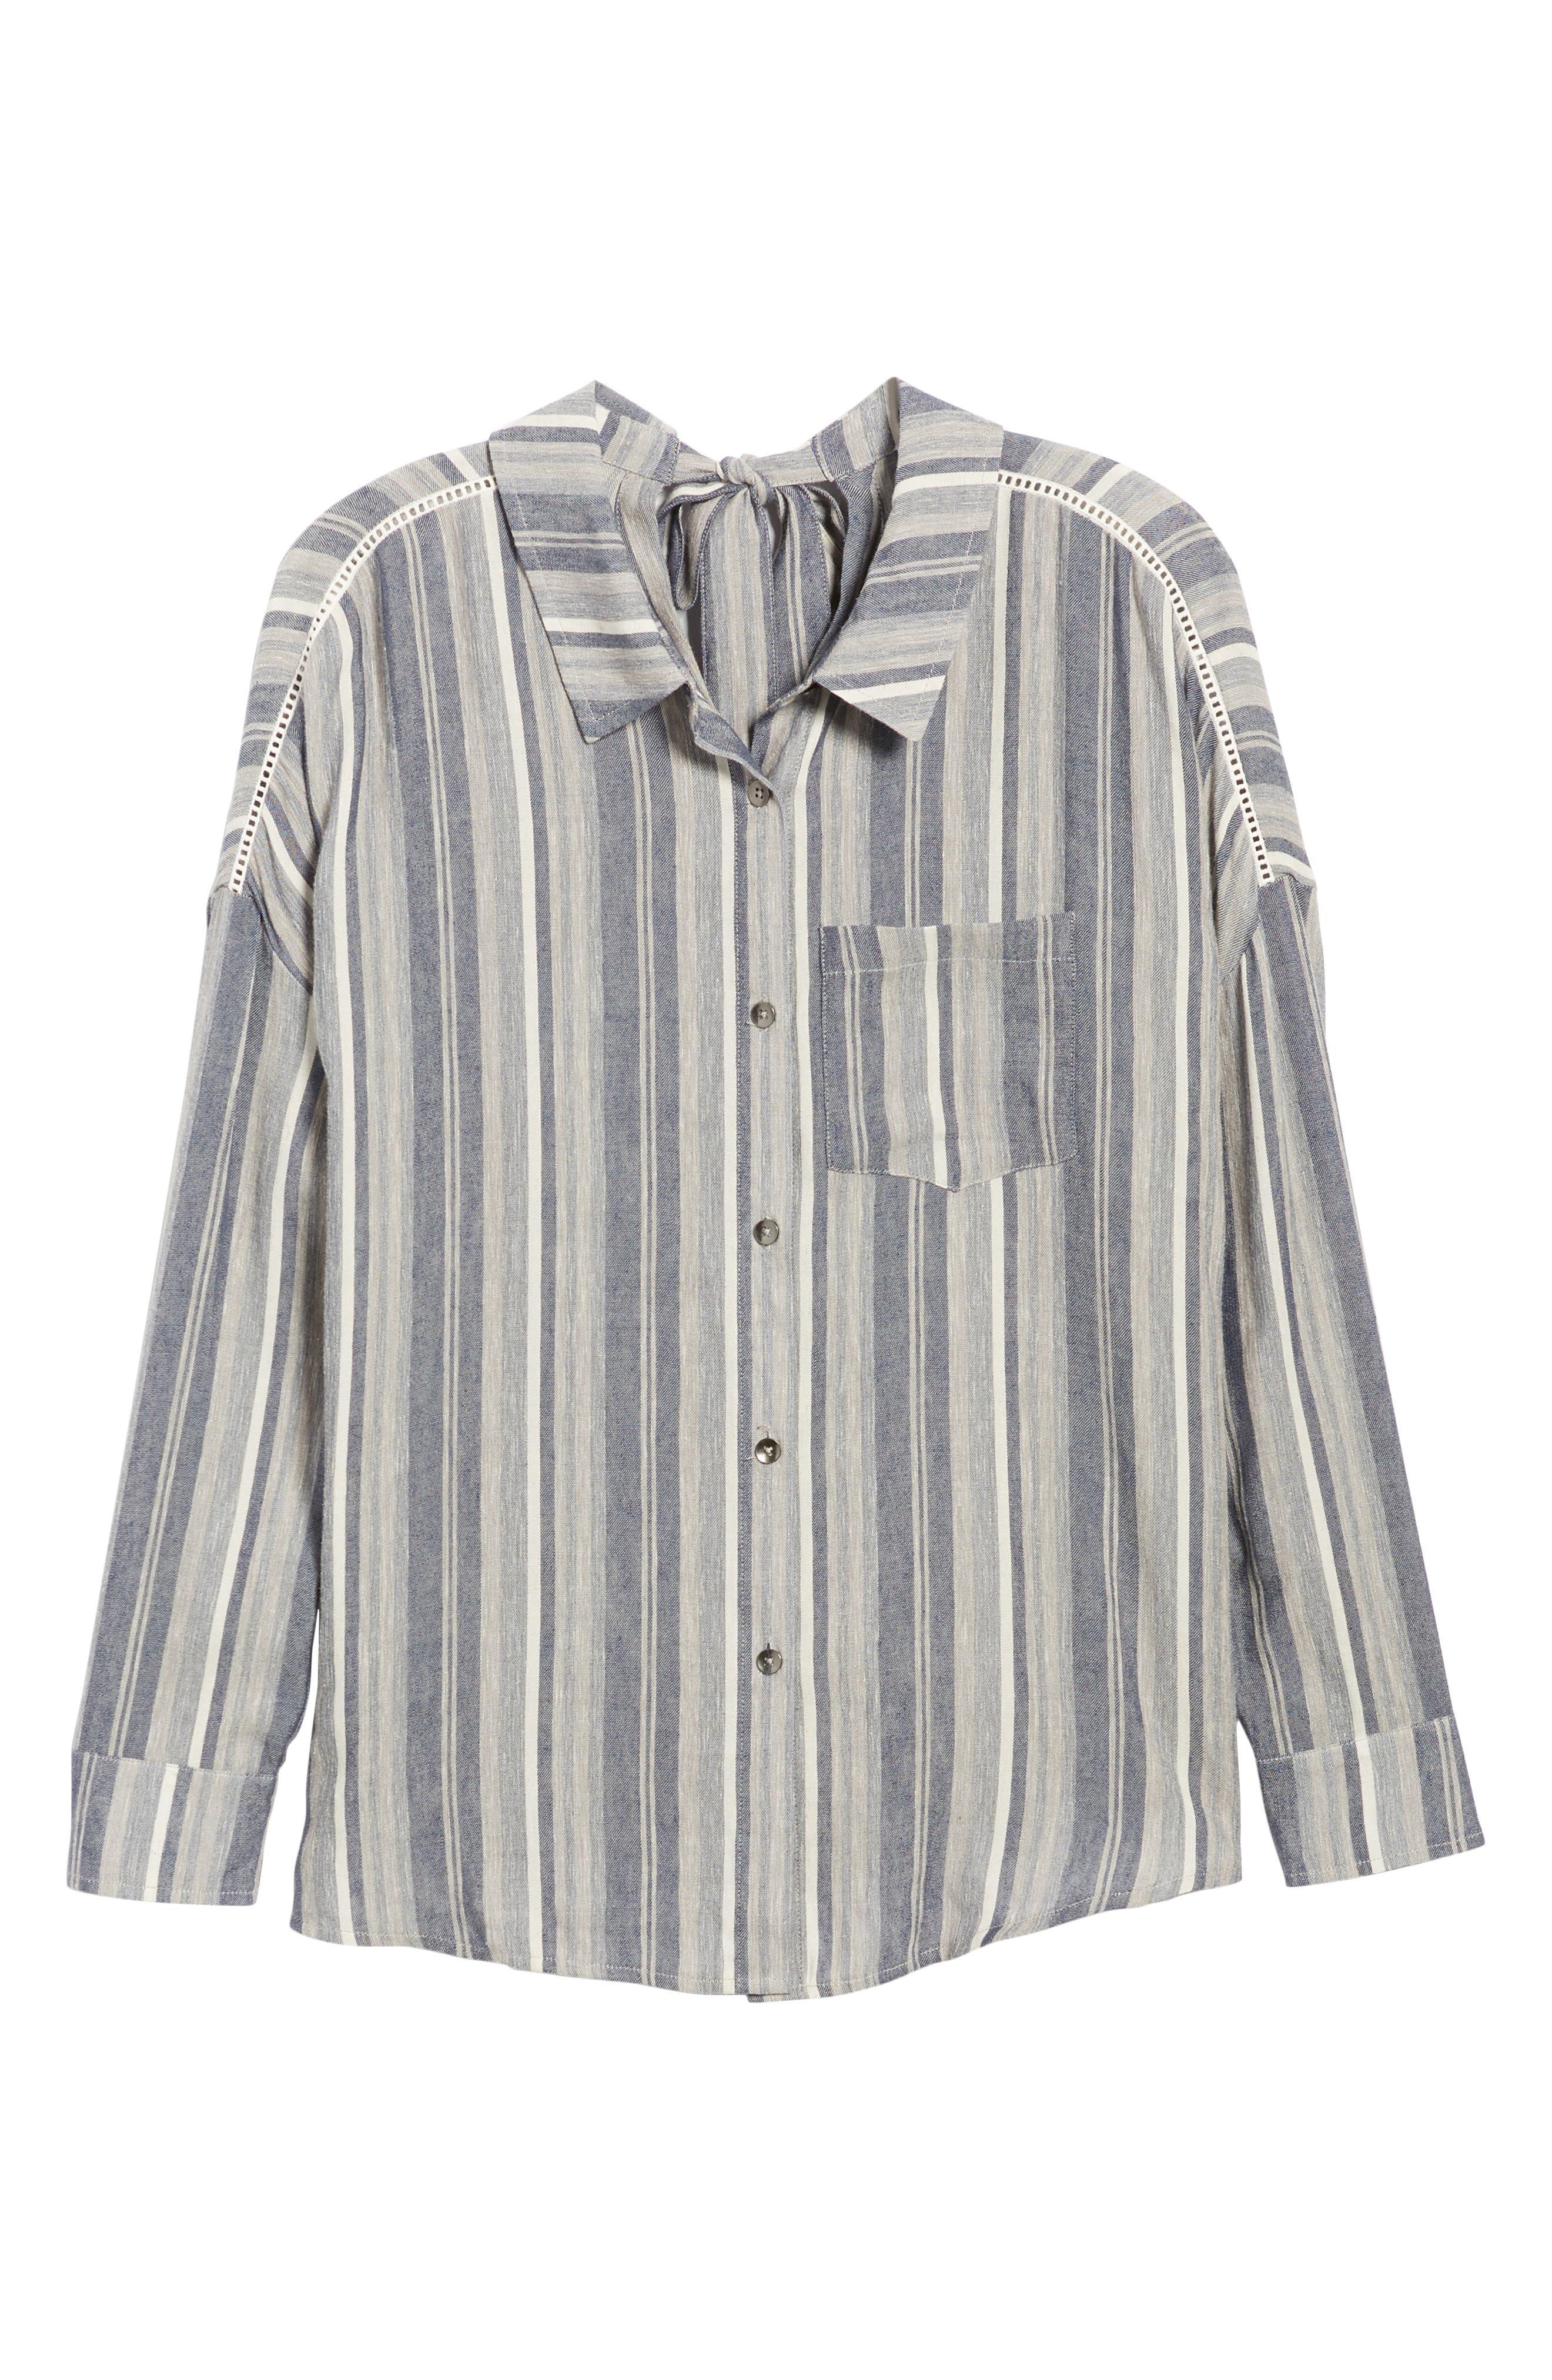 Stripe Chambray Shirt,                             Alternate thumbnail 6, color,                             Multi